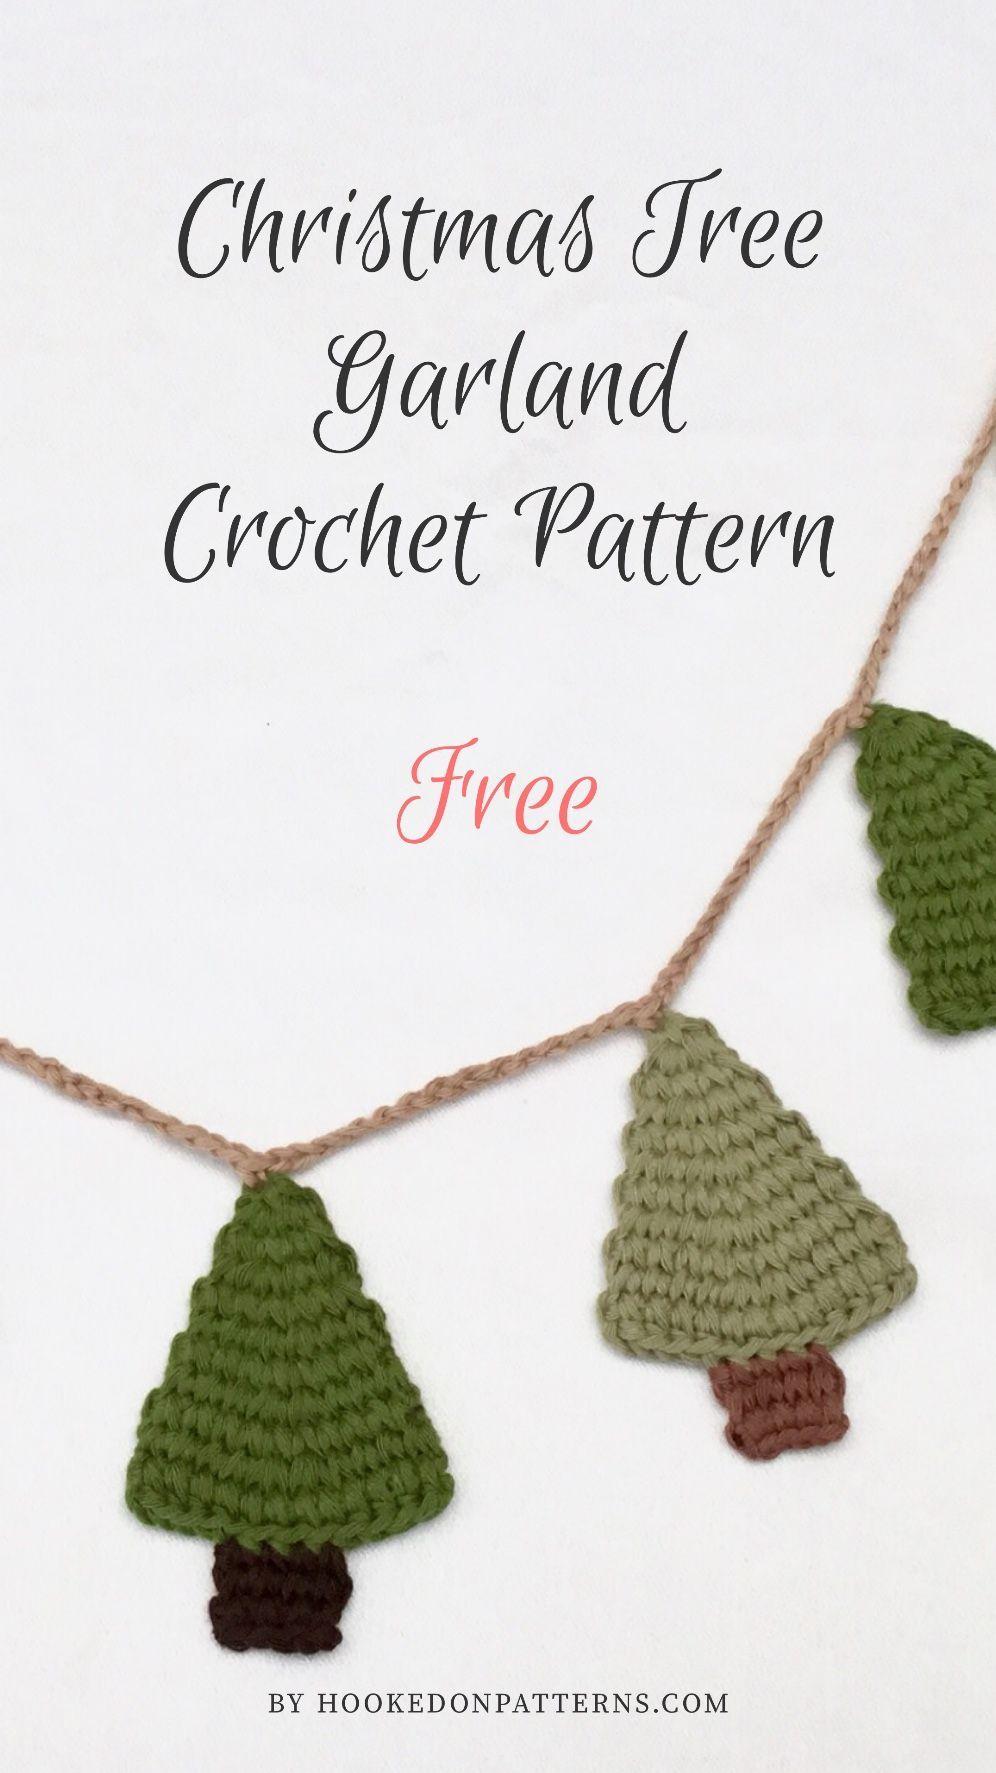 Free Crochet Christmas Tree Garland Pattern Crochet Xmas Crochet Christmas Decorations Free Christmas Crochet Patterns